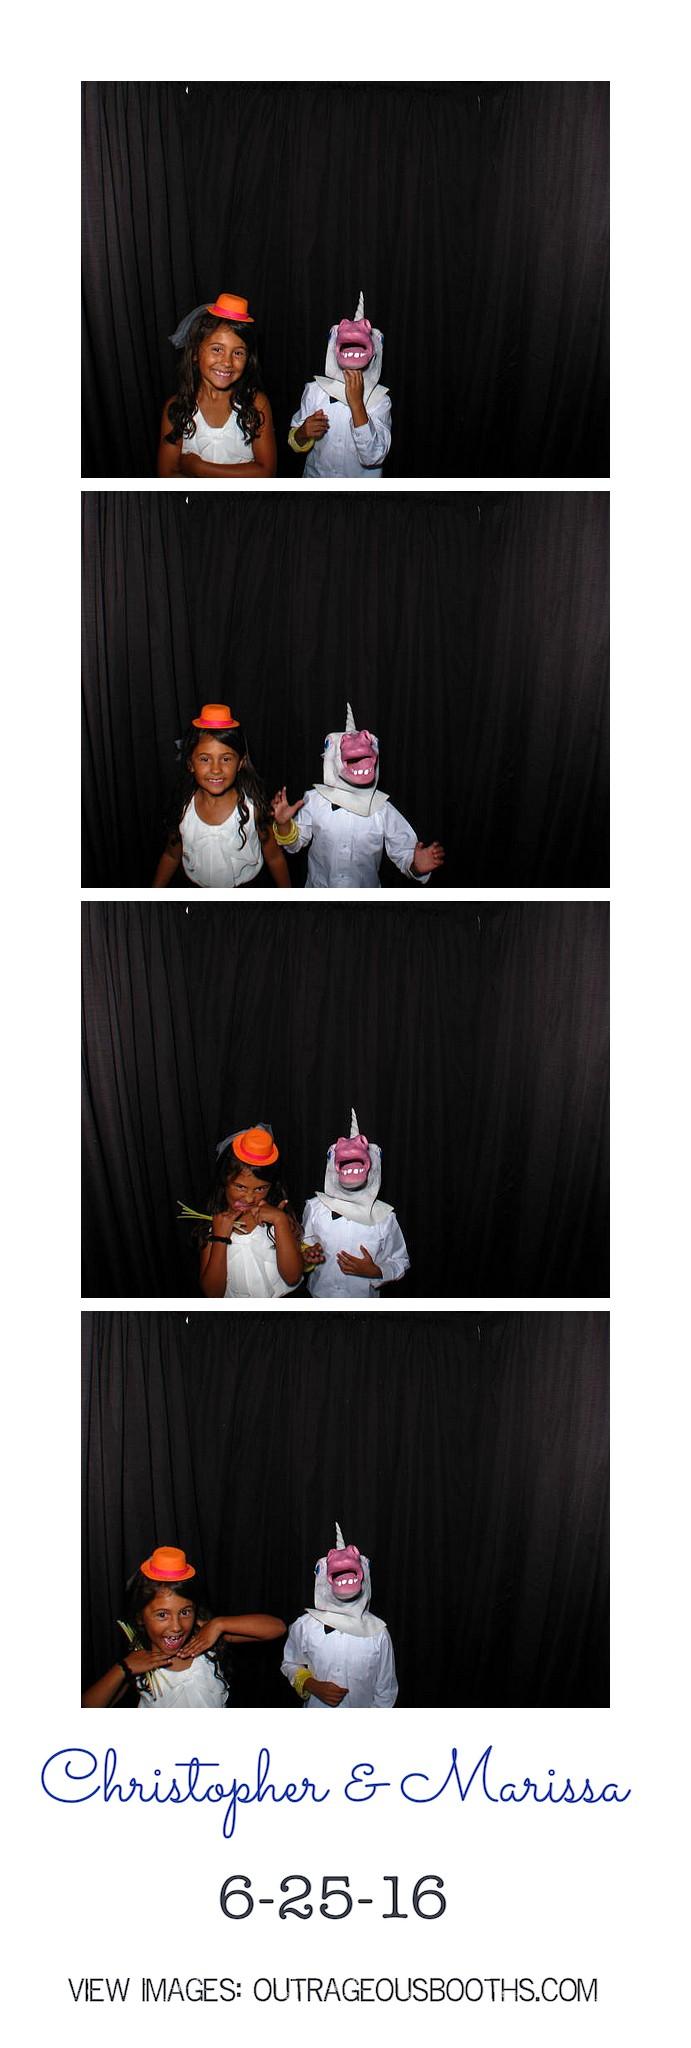 06-25-16 Christopher & Marissa